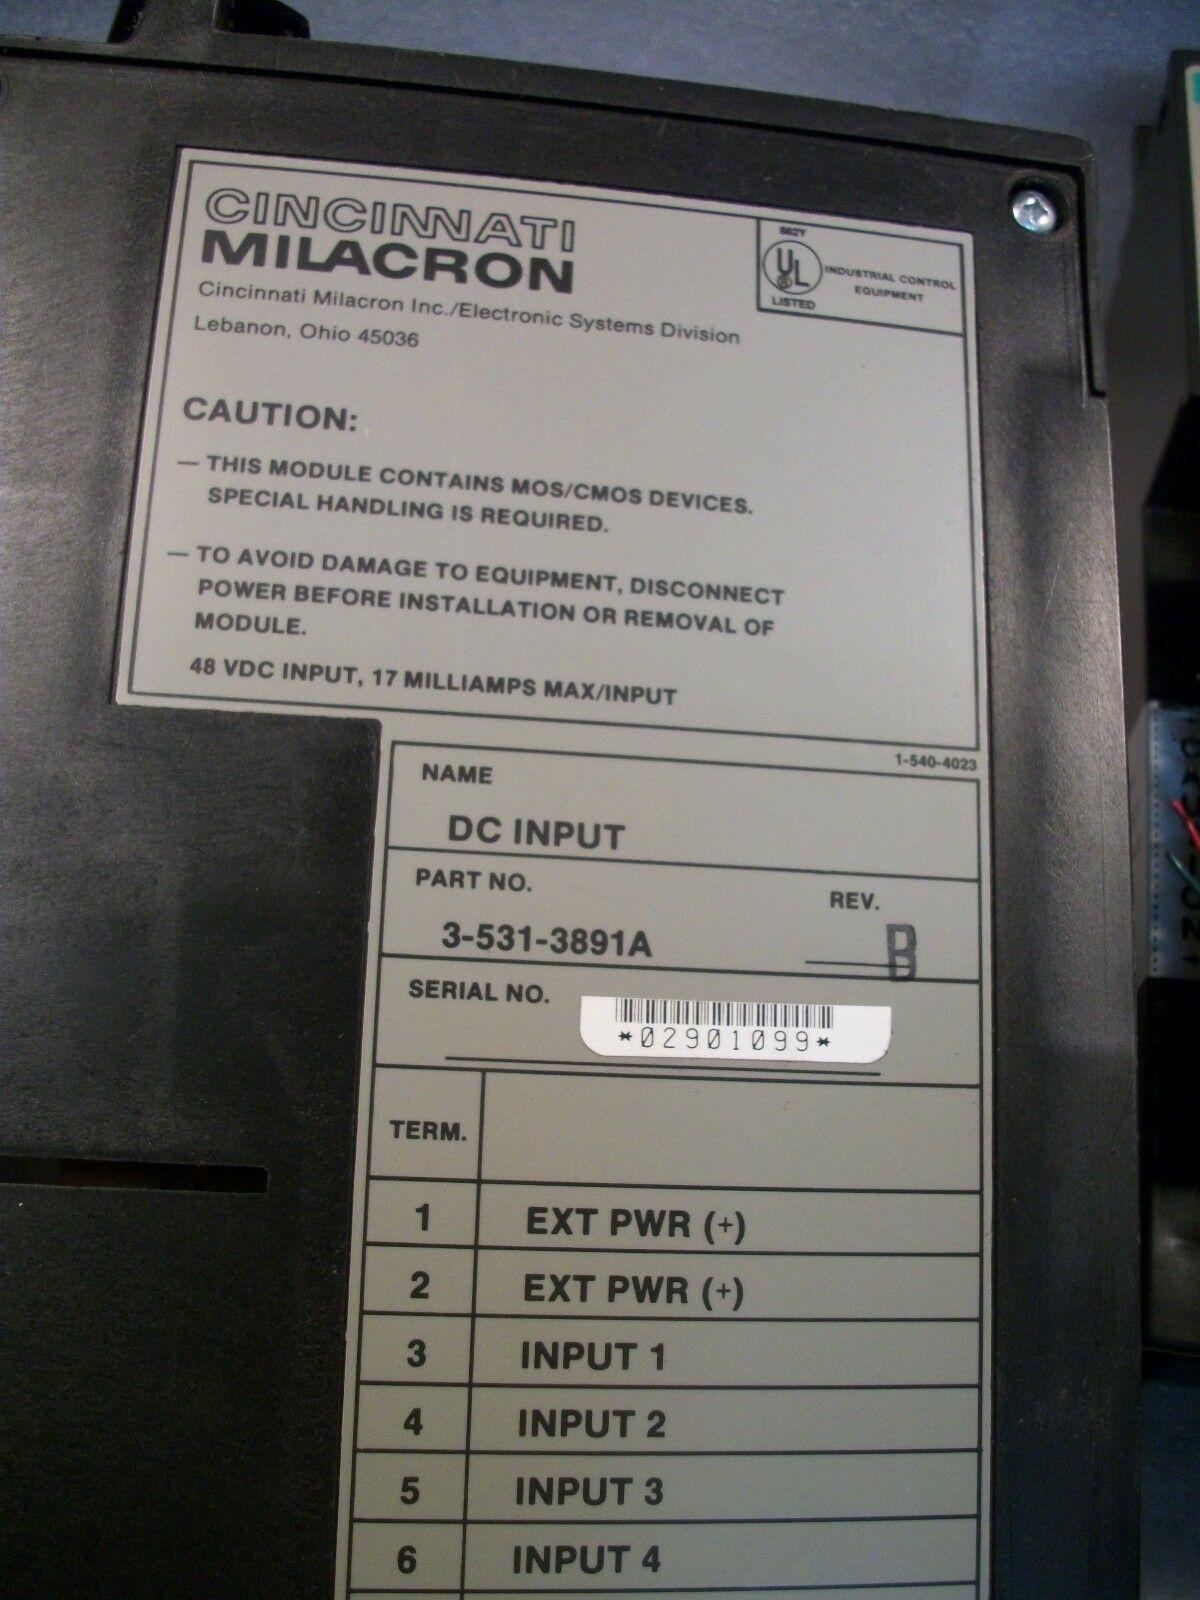 Cincinnati Milacron Siemens CNC Control Circuit I/O Board 3-531-3891A